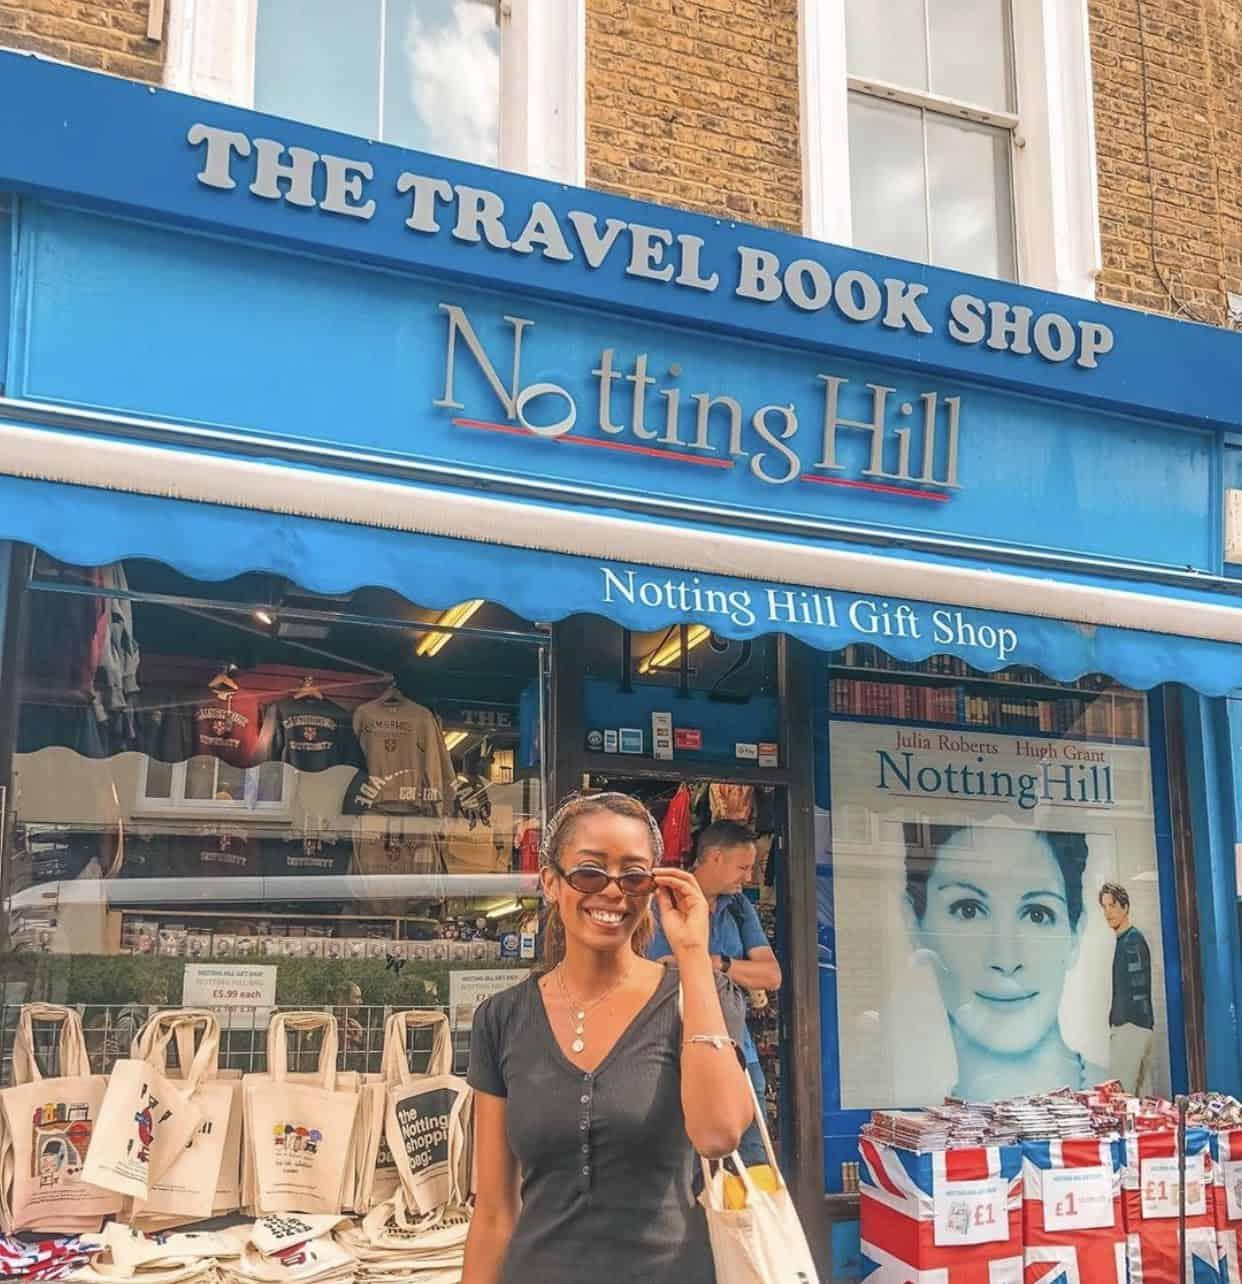 Notting Hill Travel Bookstore, London